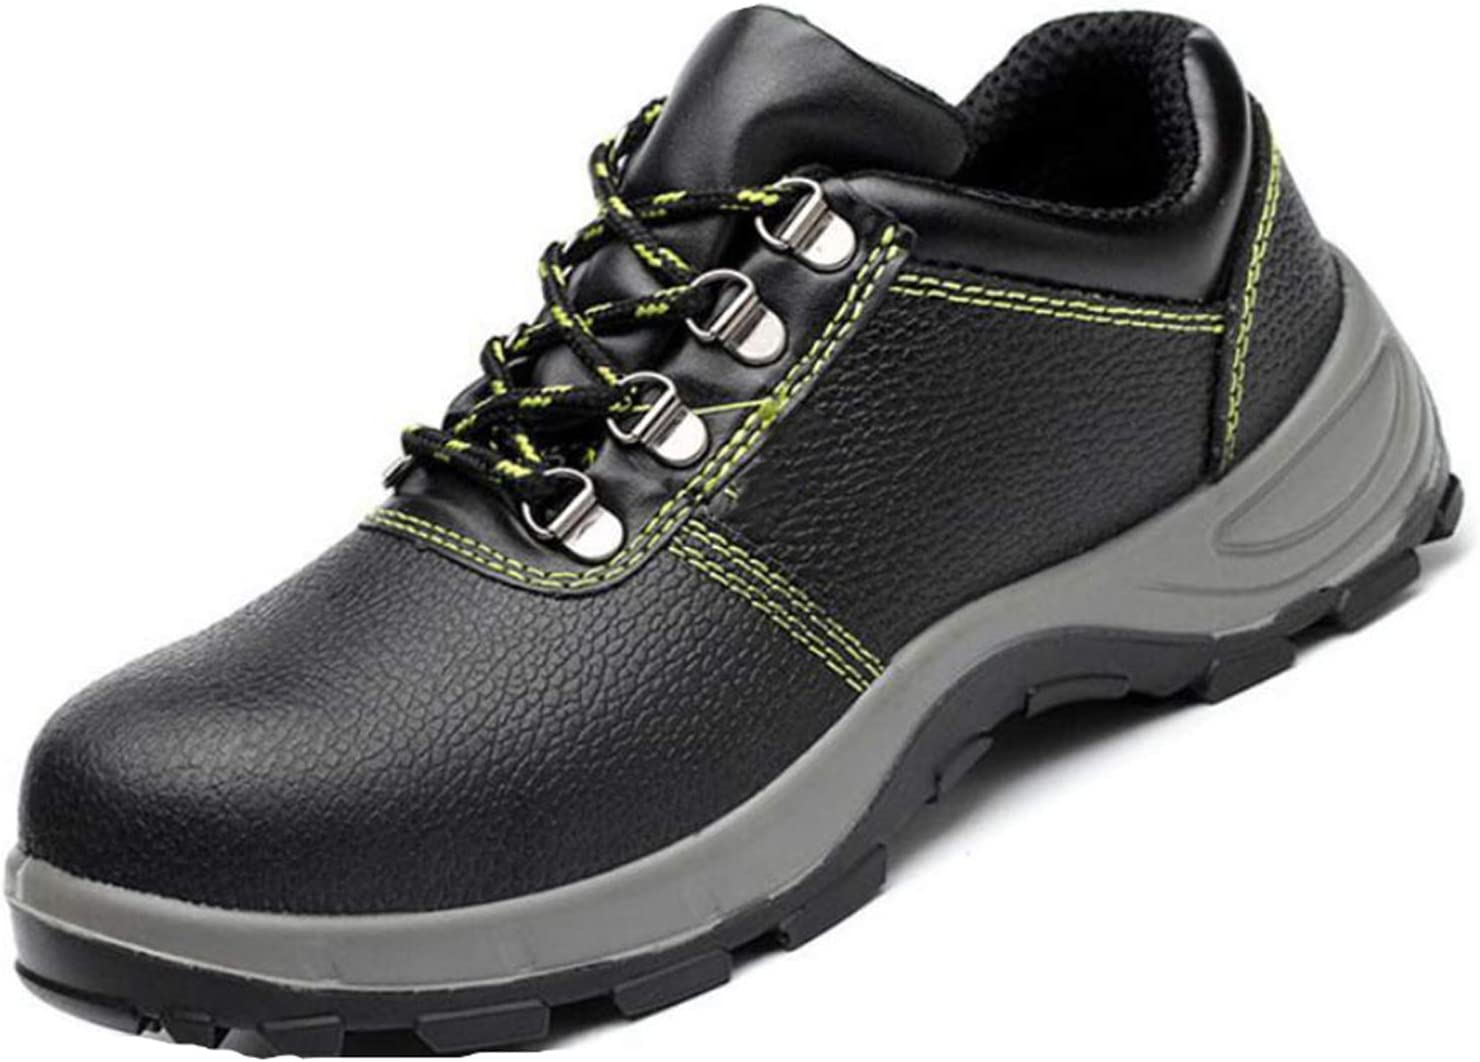 YLJXXY Men's Work Safety ShoesWaterproof Industrial Construction Steel Toe Footwear Outdoor Slip Resistant Puncture Proof Boots,Black Low Cut,39